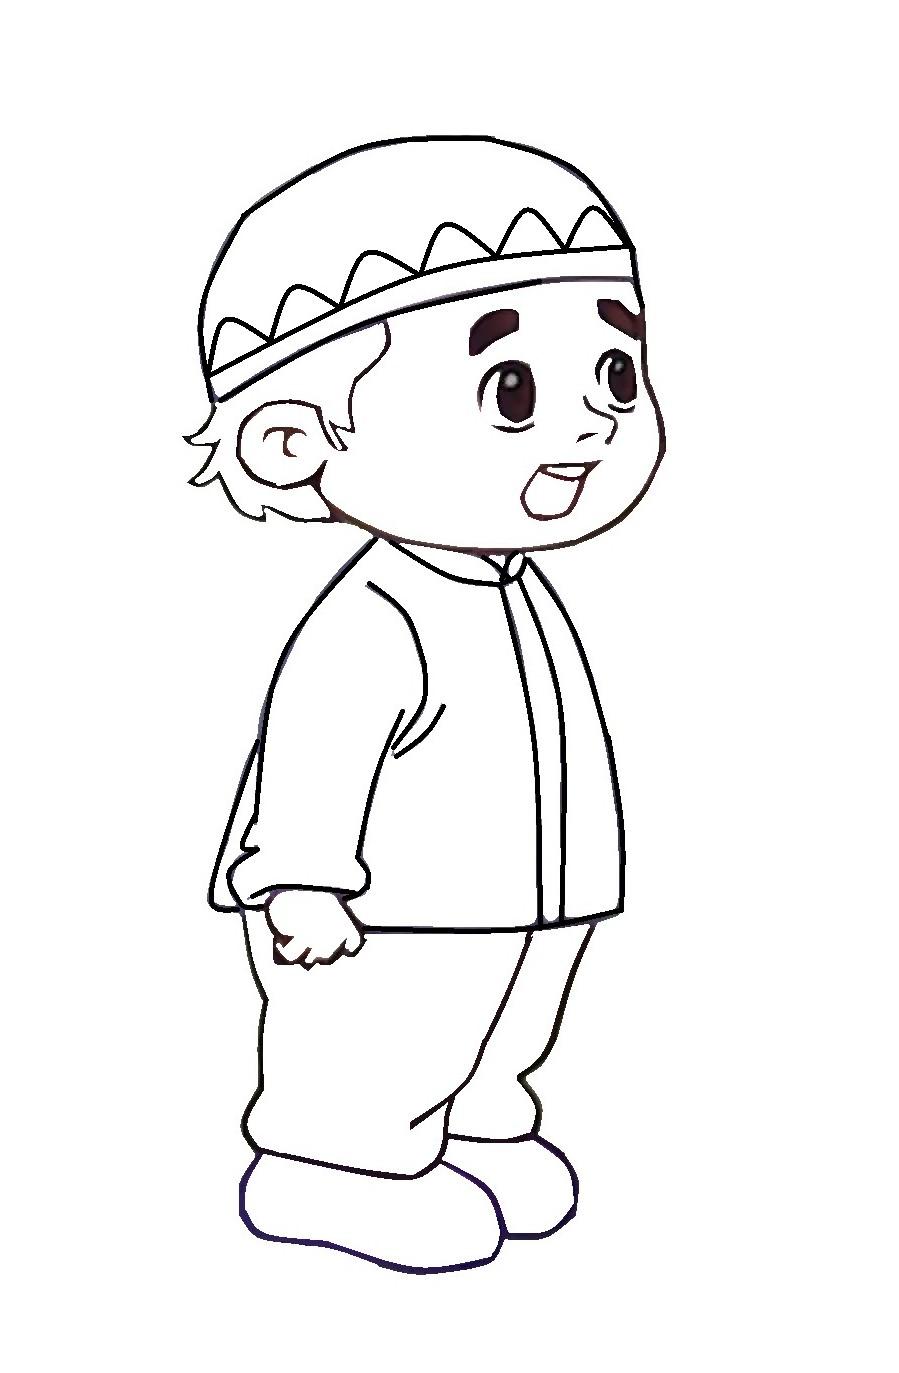 Gambar Orang Kartun Hitam Putih